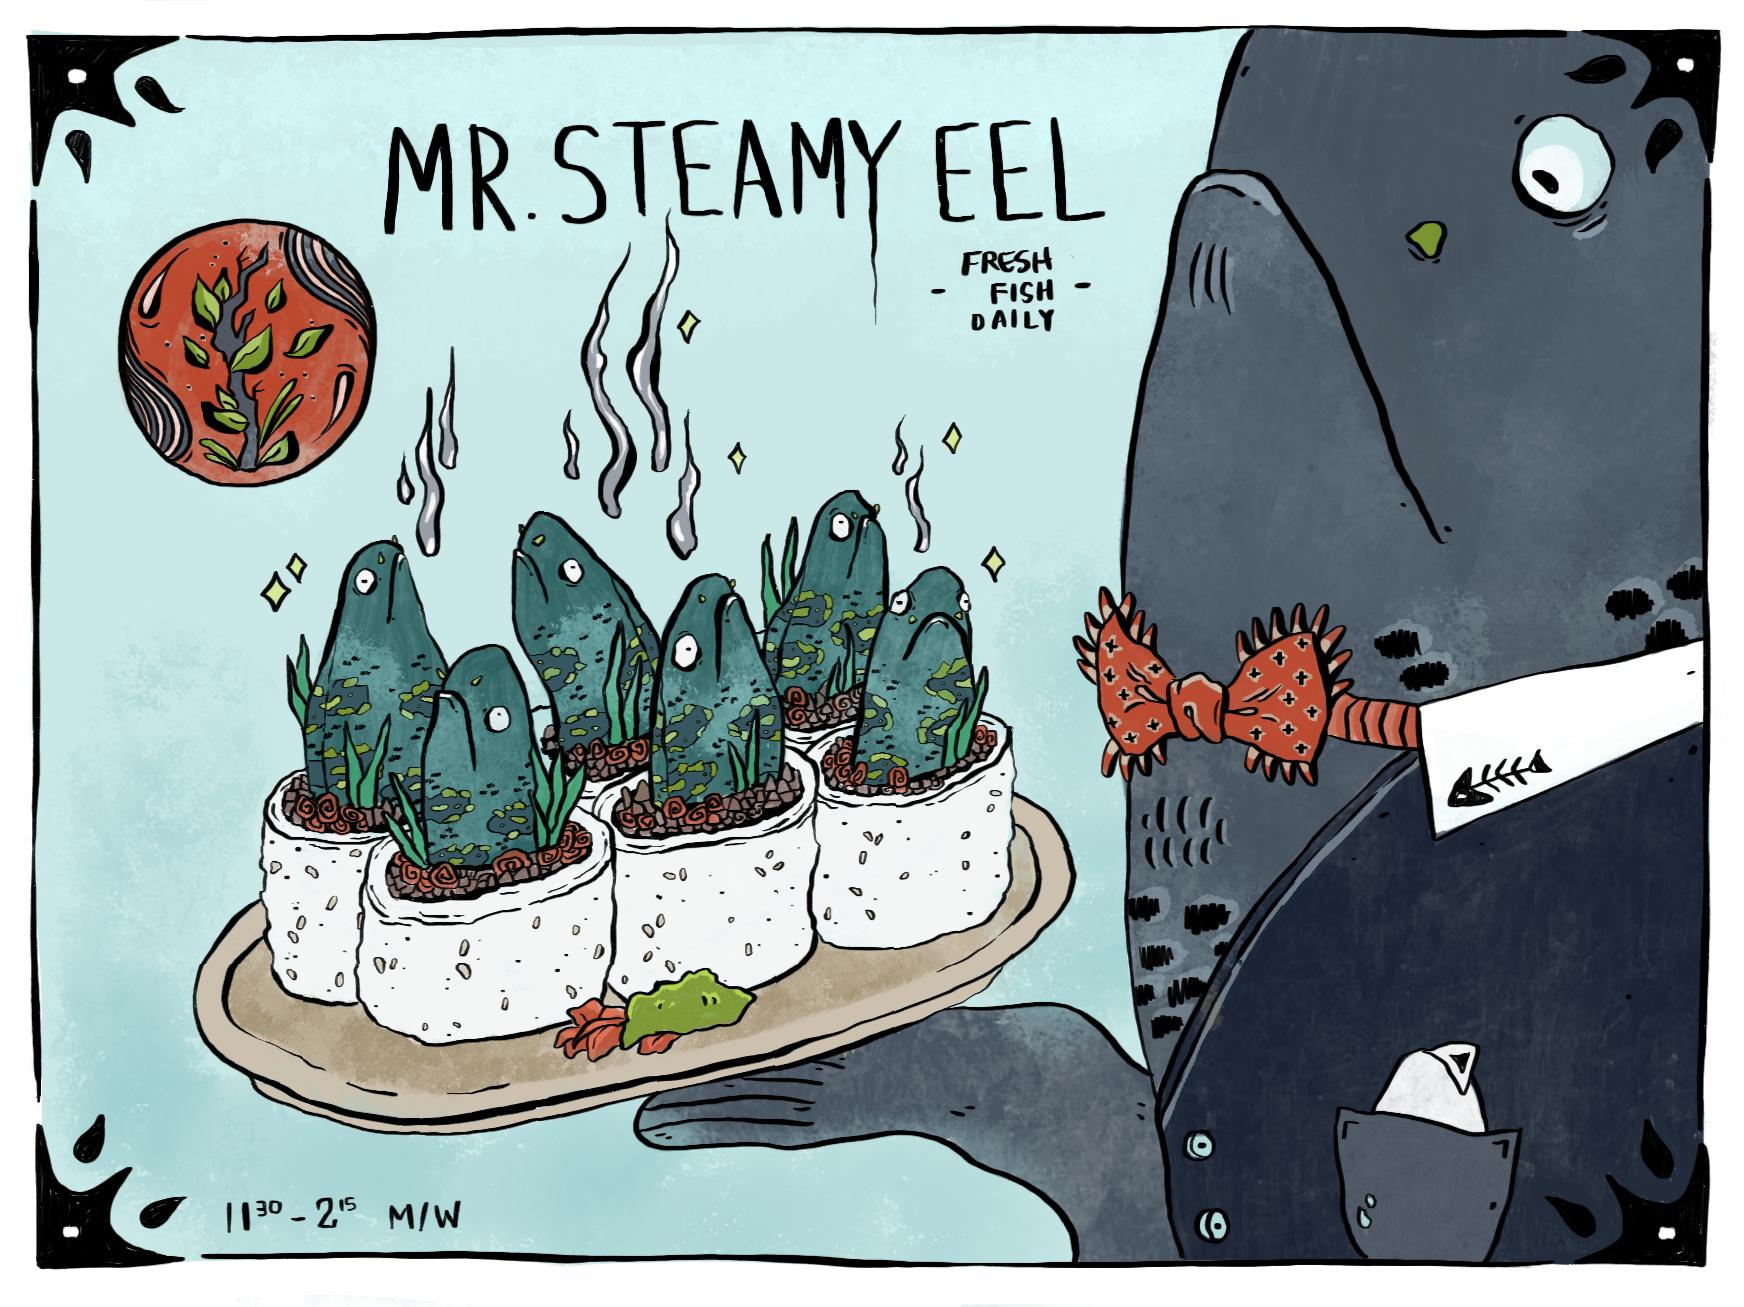 Mr. Steamy Eel